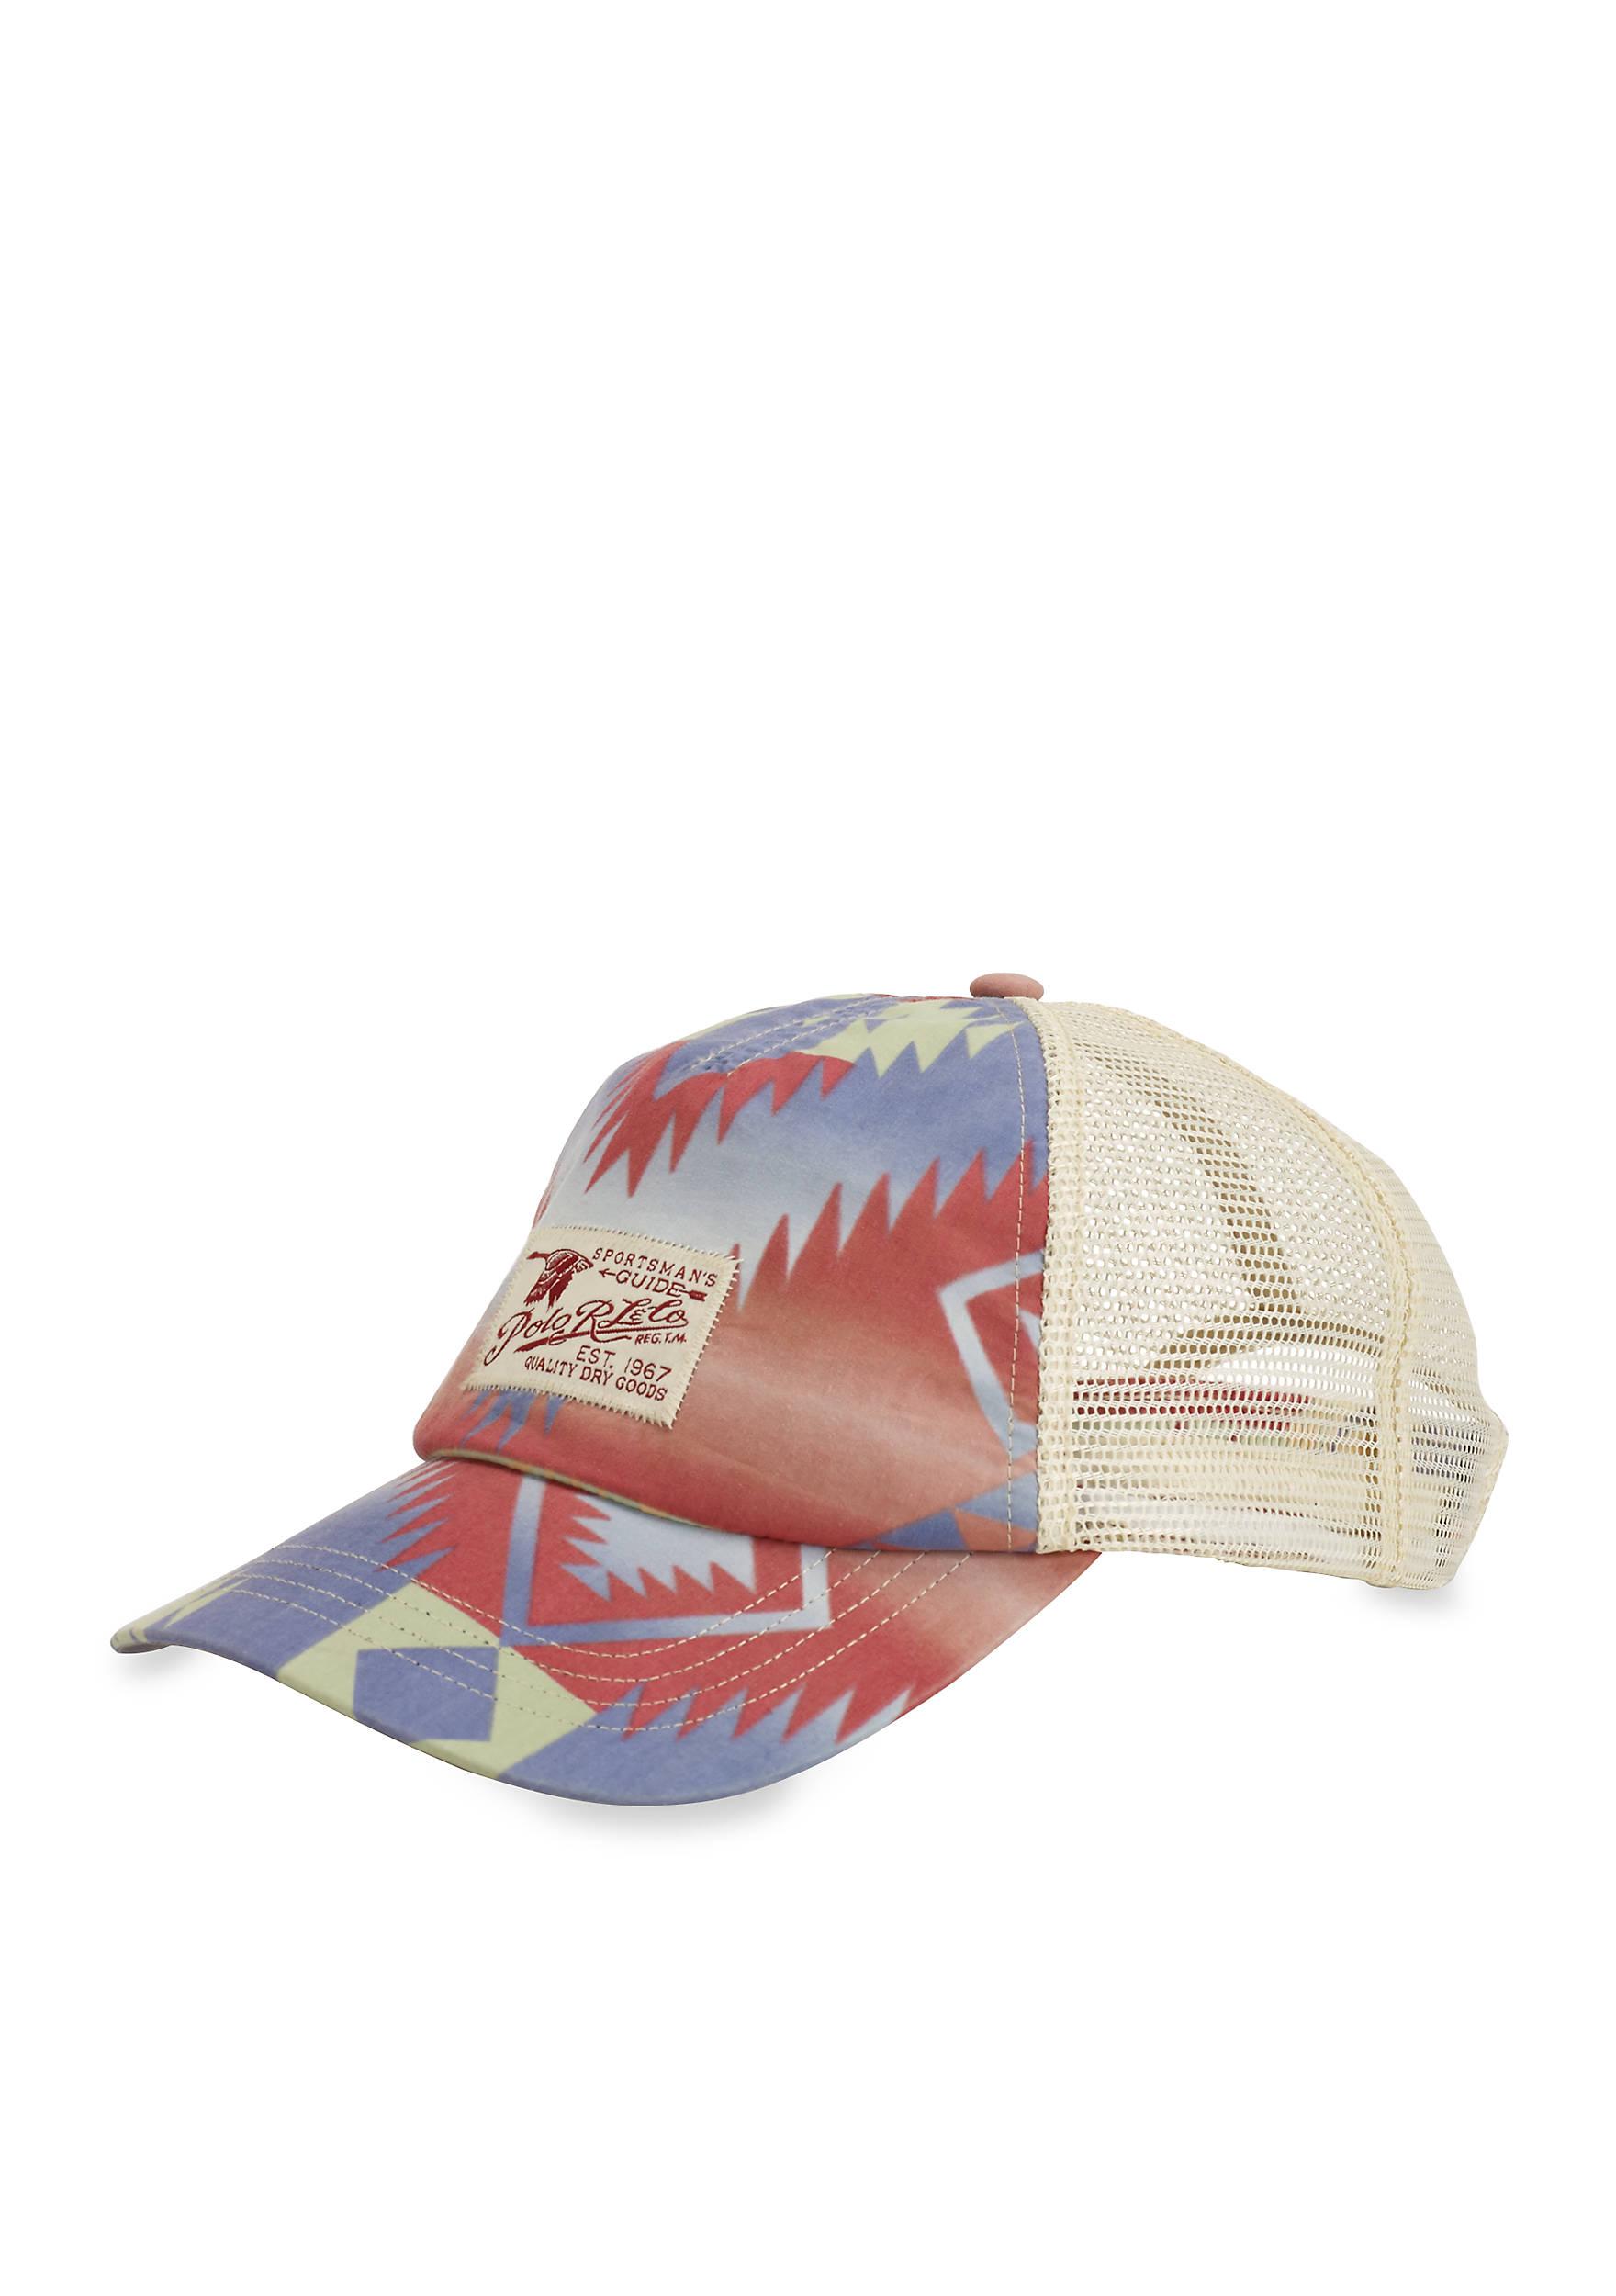 46713987d83 Polo Ralph Lauren Camo Trucker Hat